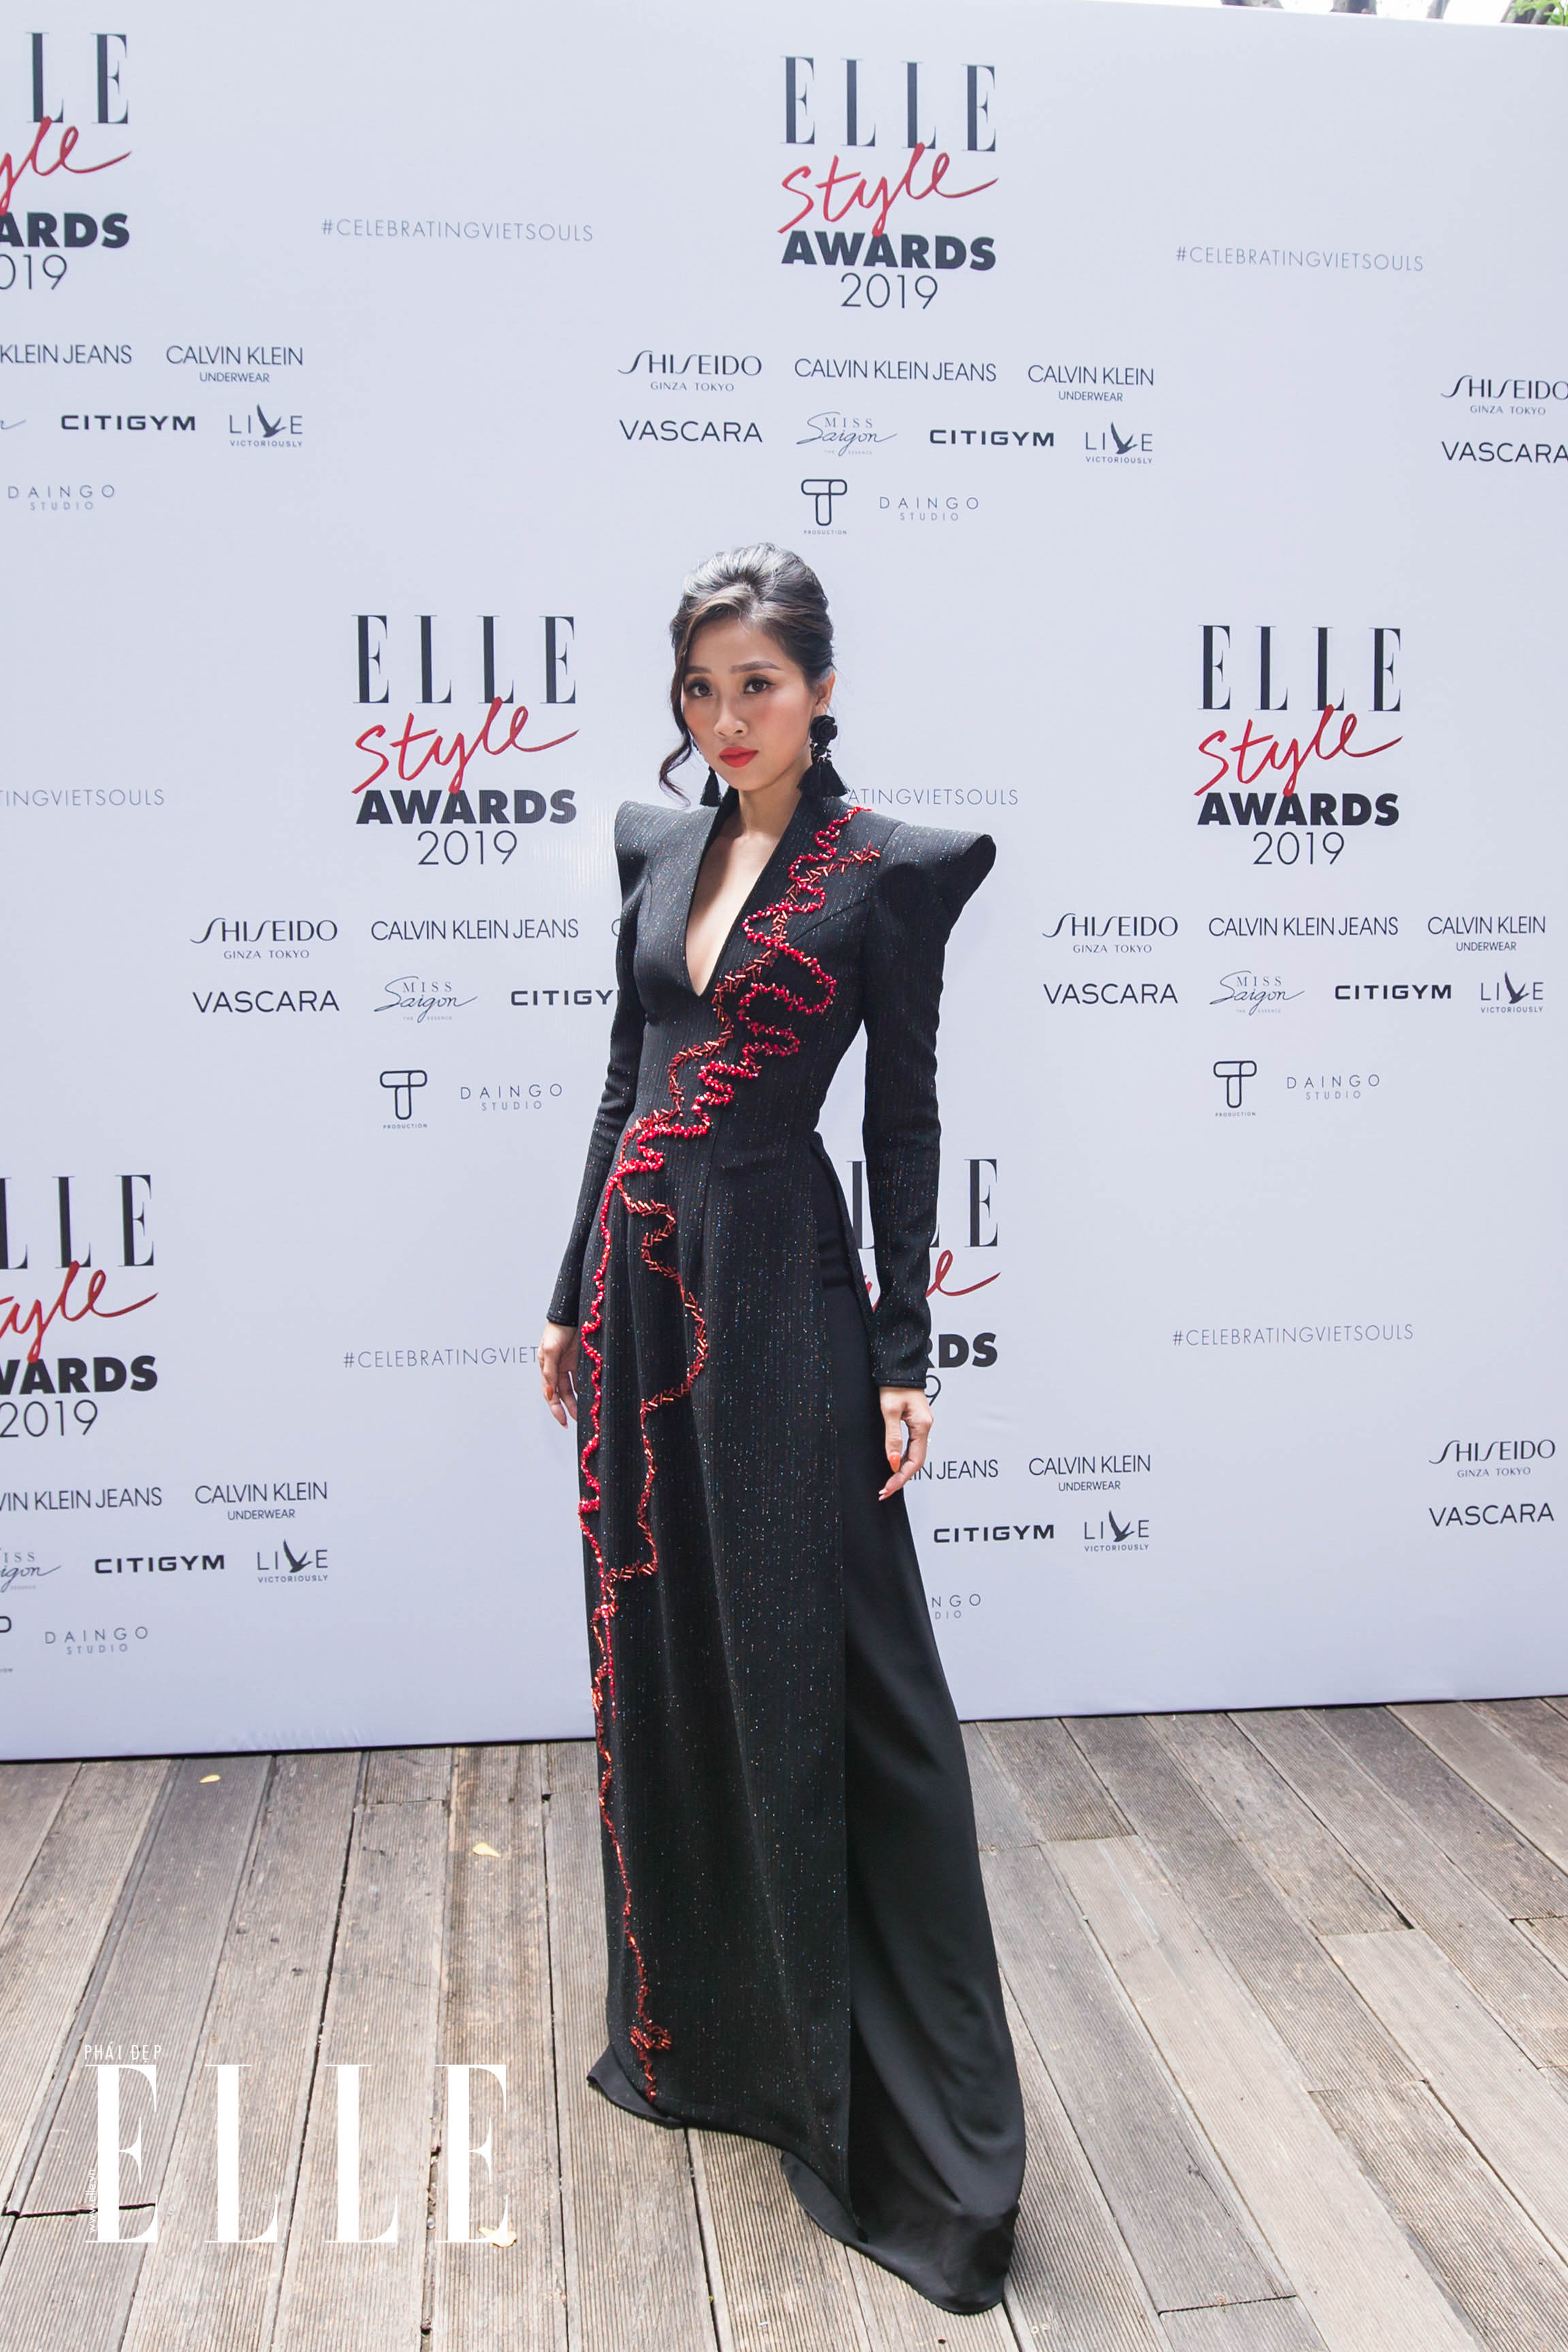 elle style awards 2019 10